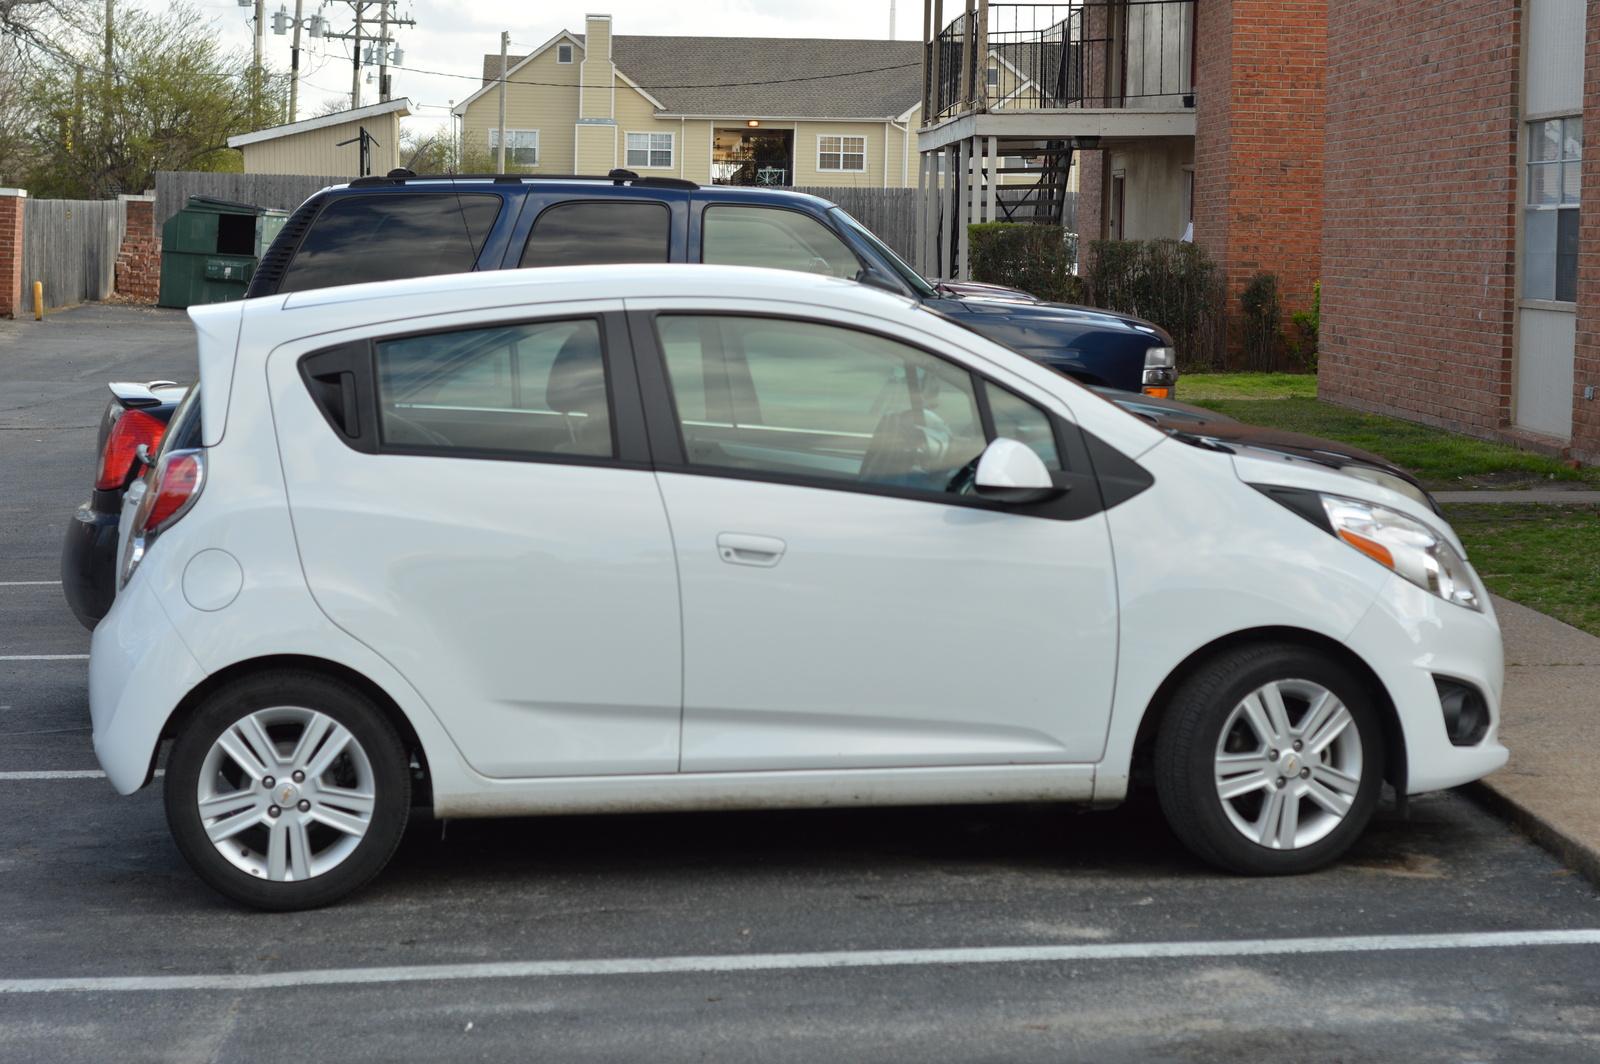 New 2014 Chevrolet Spark For Sale - CarGurus